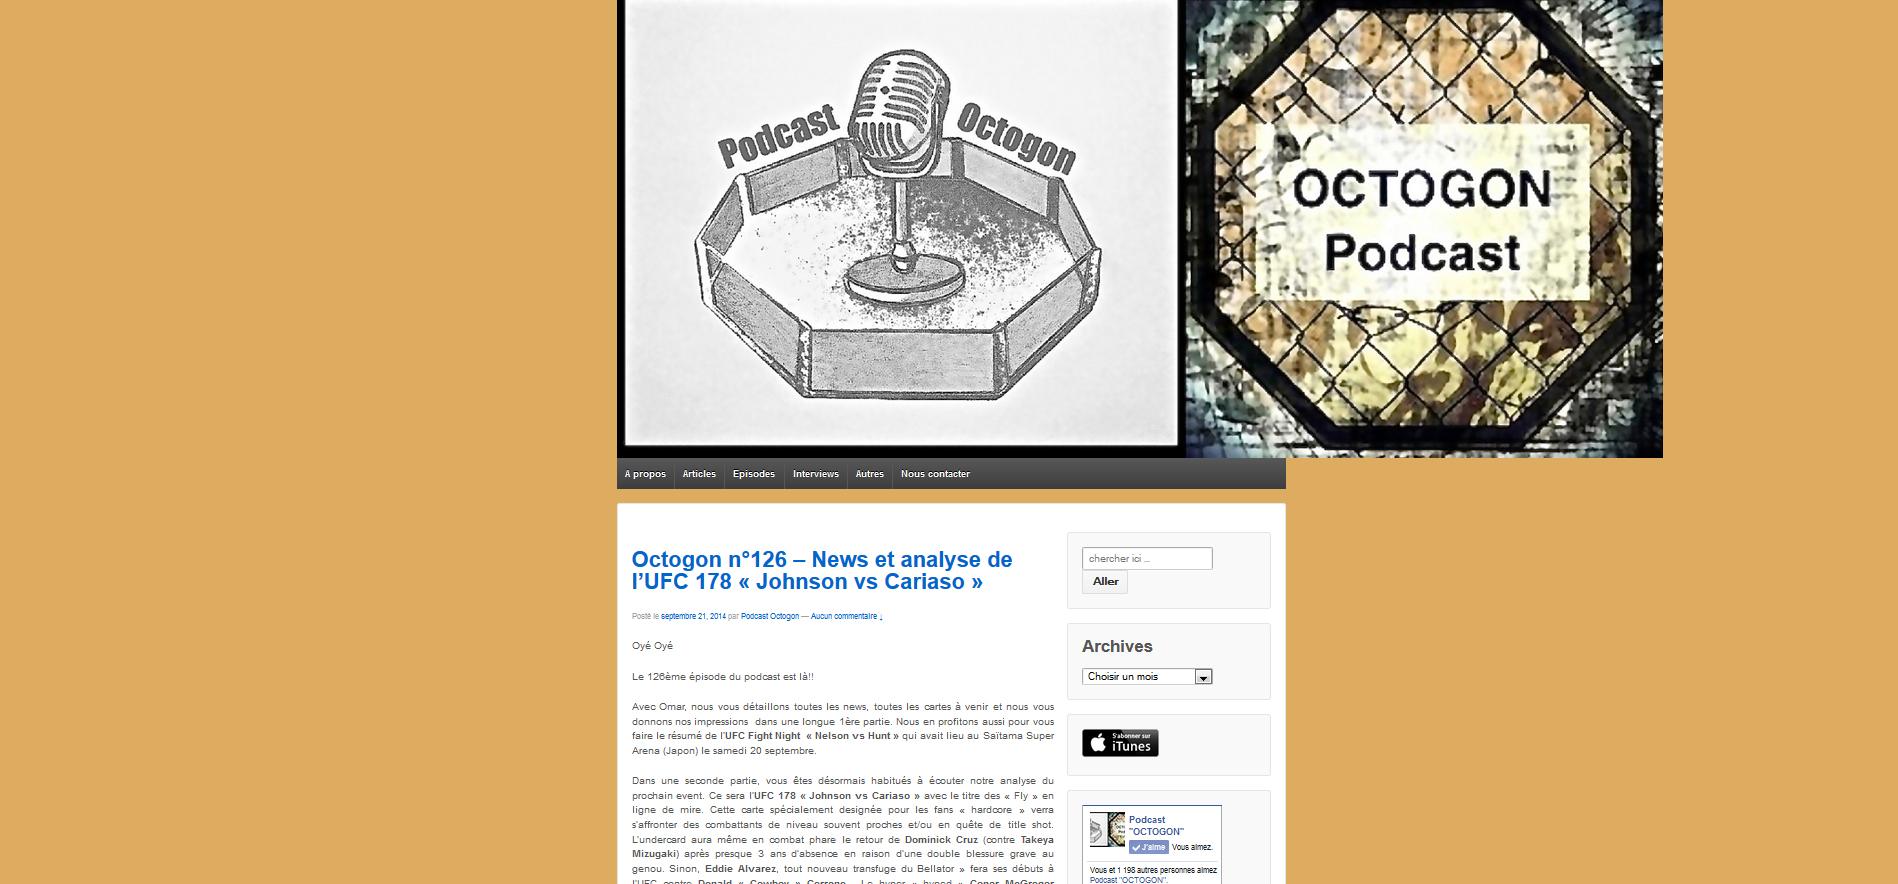 Octogon-podcast